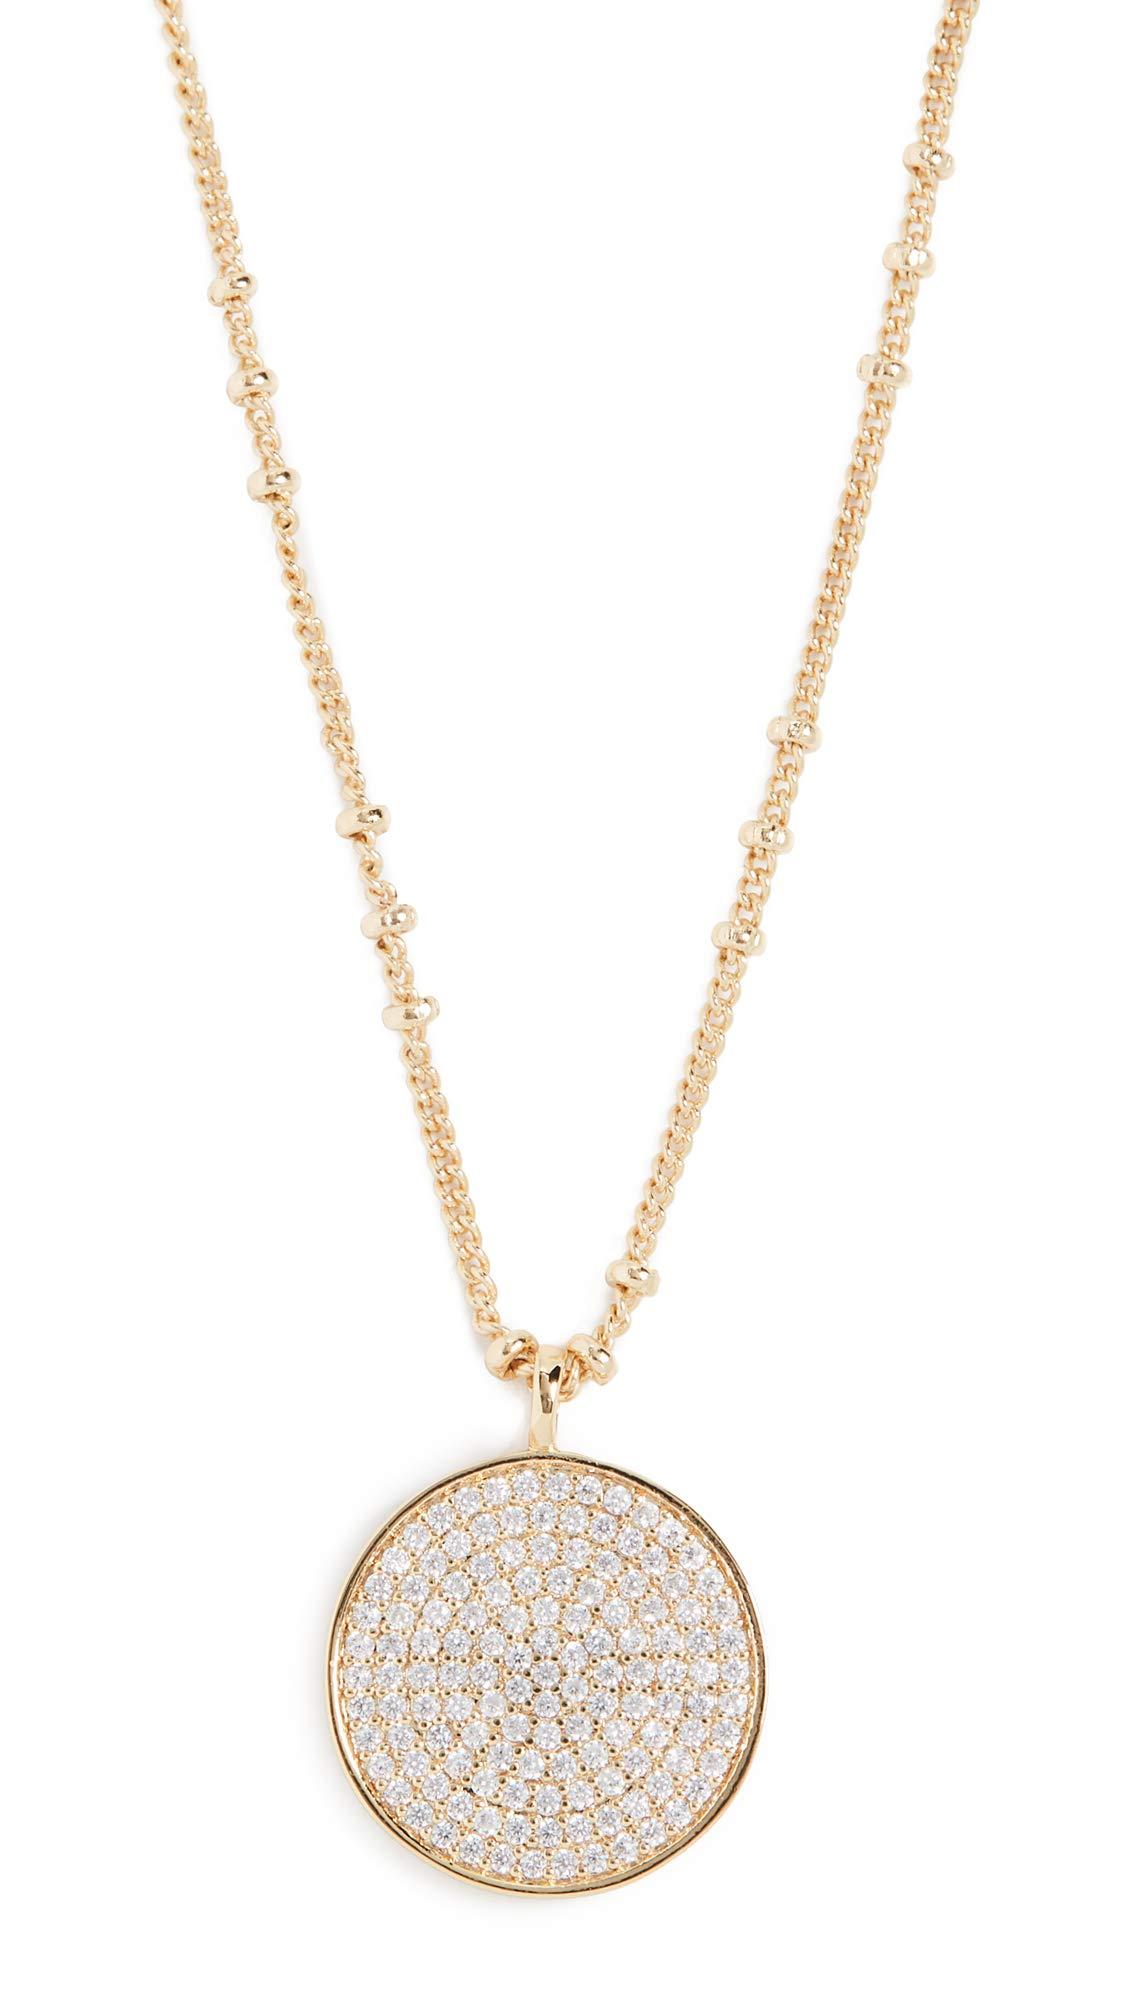 gorjana Women's Pristine Coin Necklace, Yellow Gold, One Size